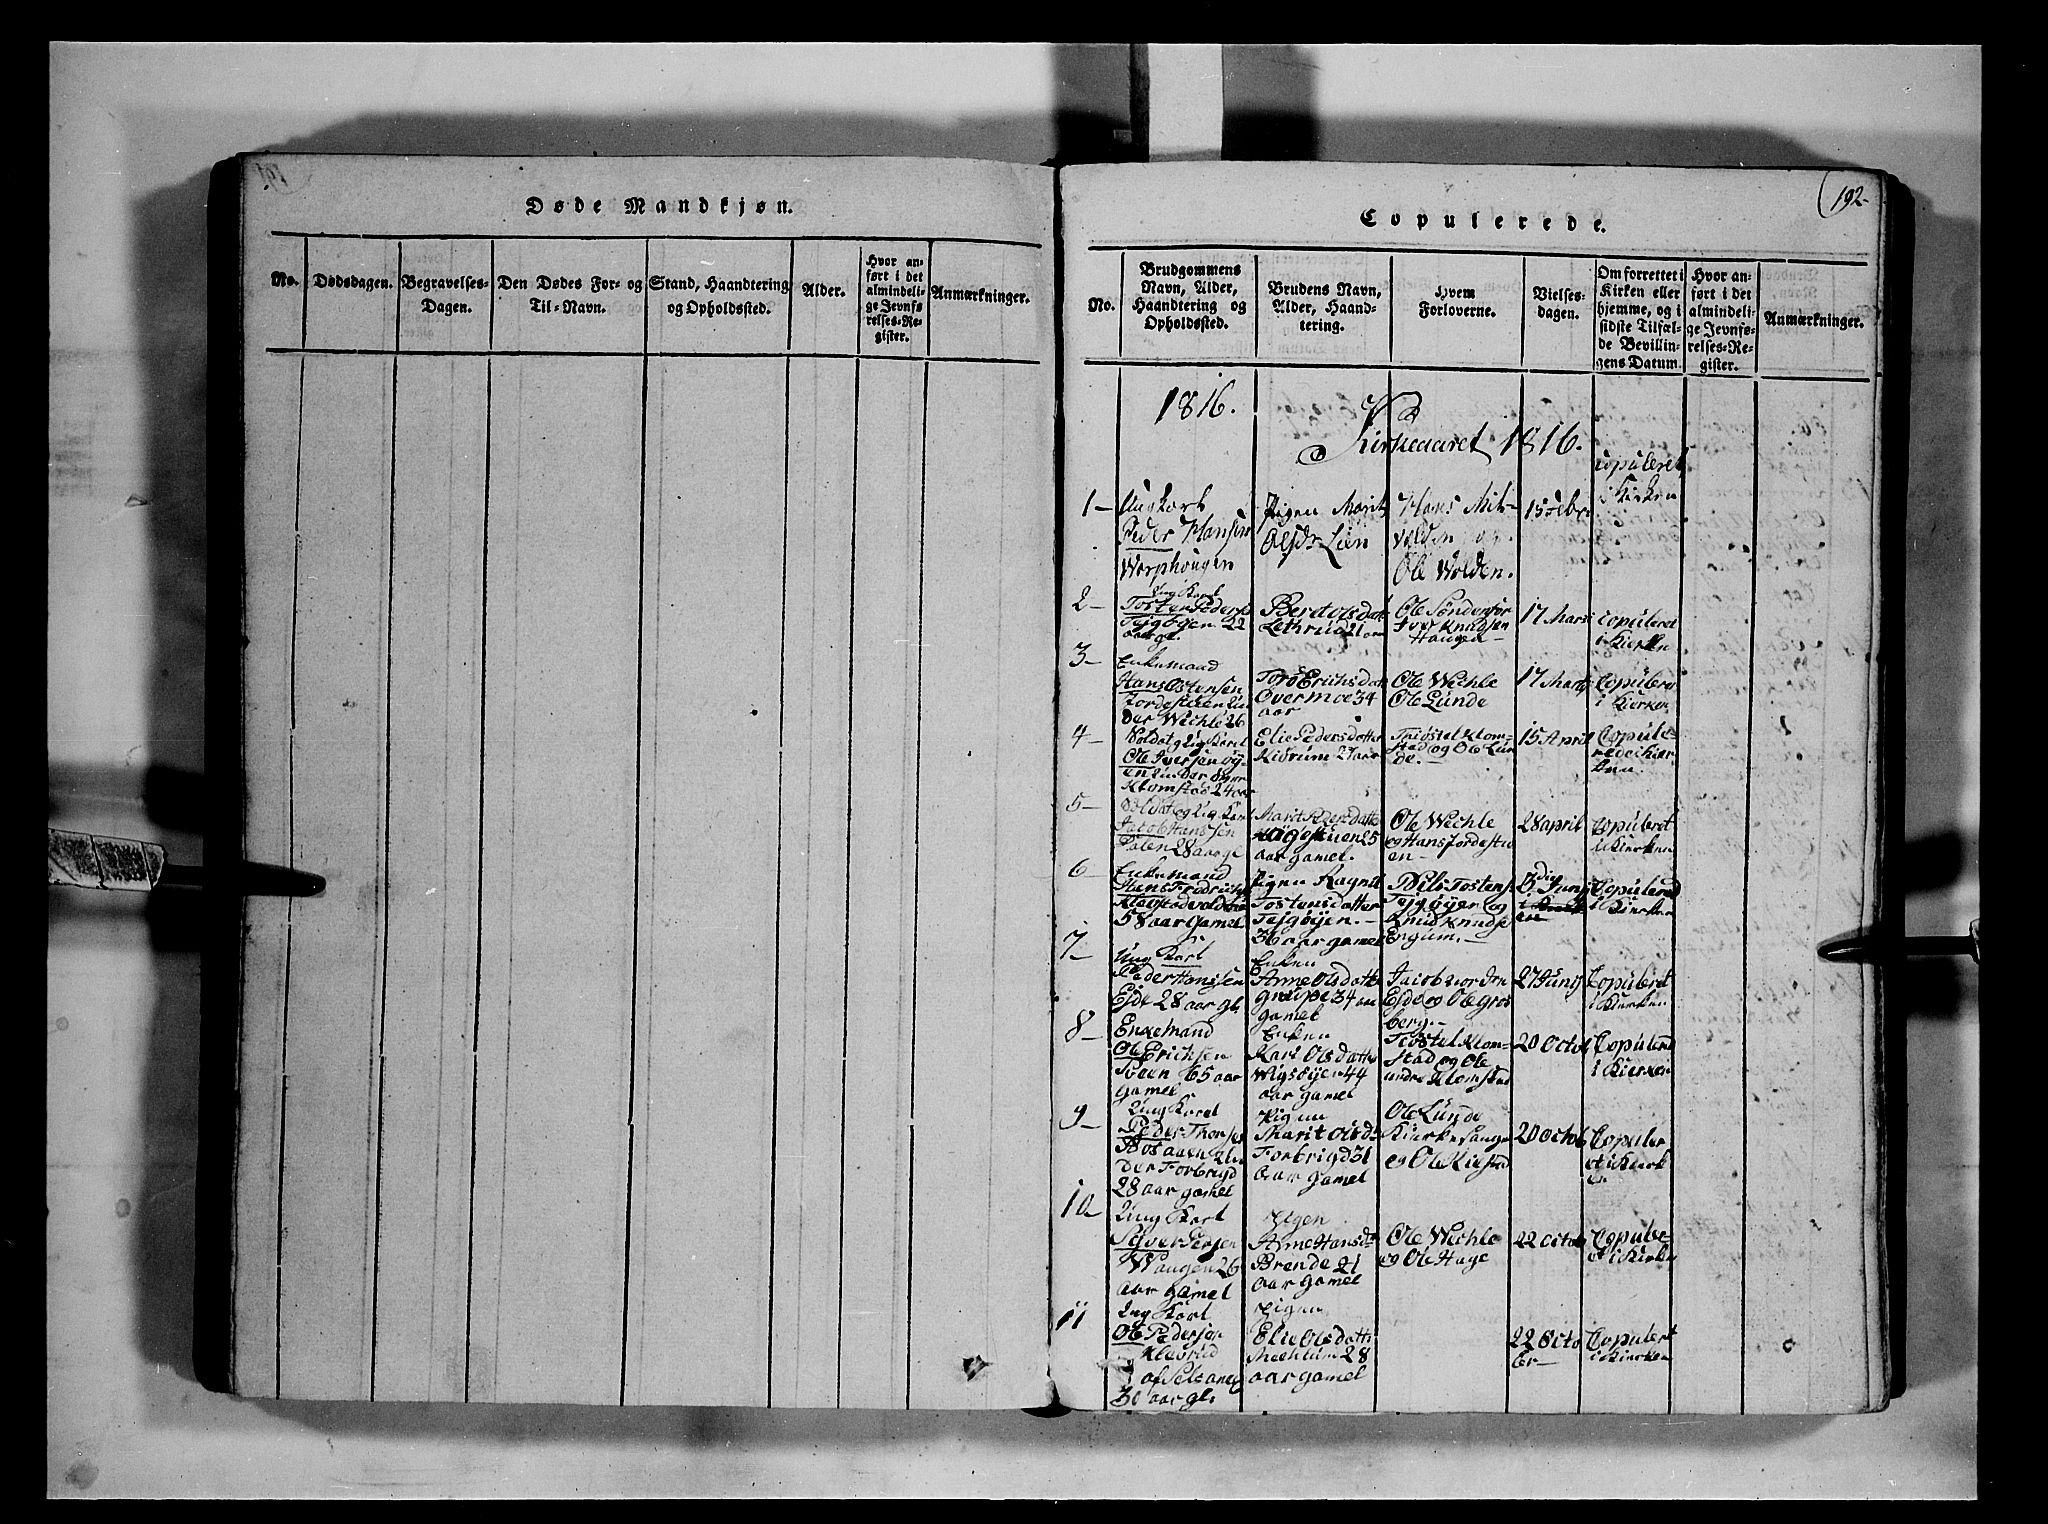 SAH, Fron prestekontor, H/Ha/Hab/L0002: Klokkerbok nr. 2, 1816-1850, s. 192